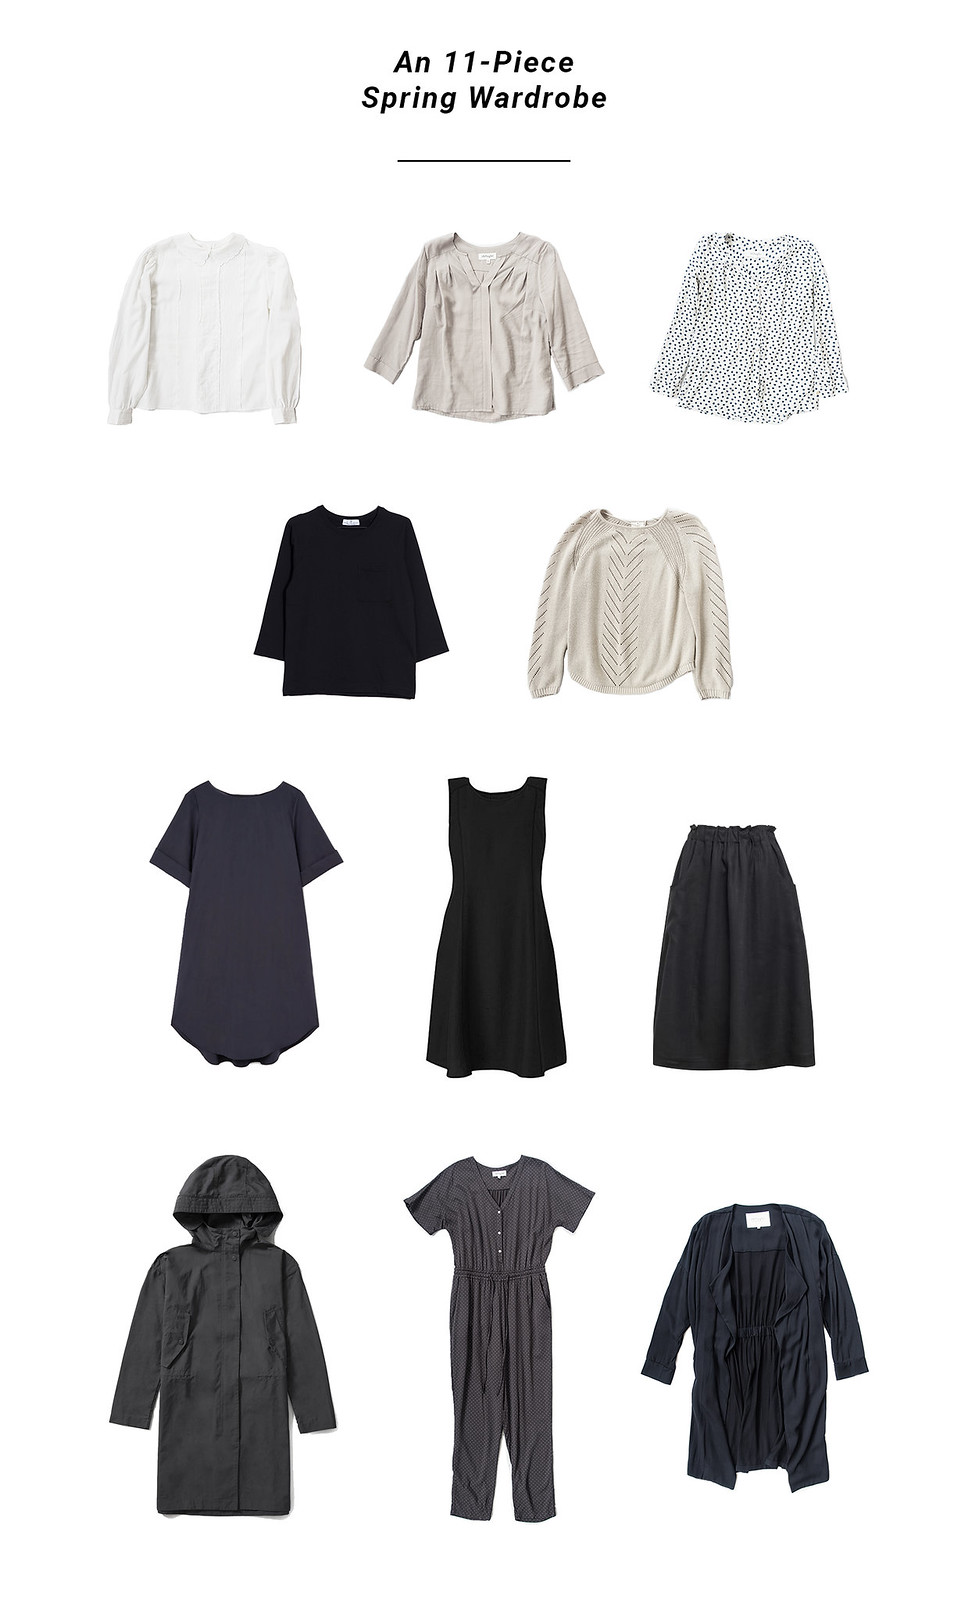 A Spring Wardrobe